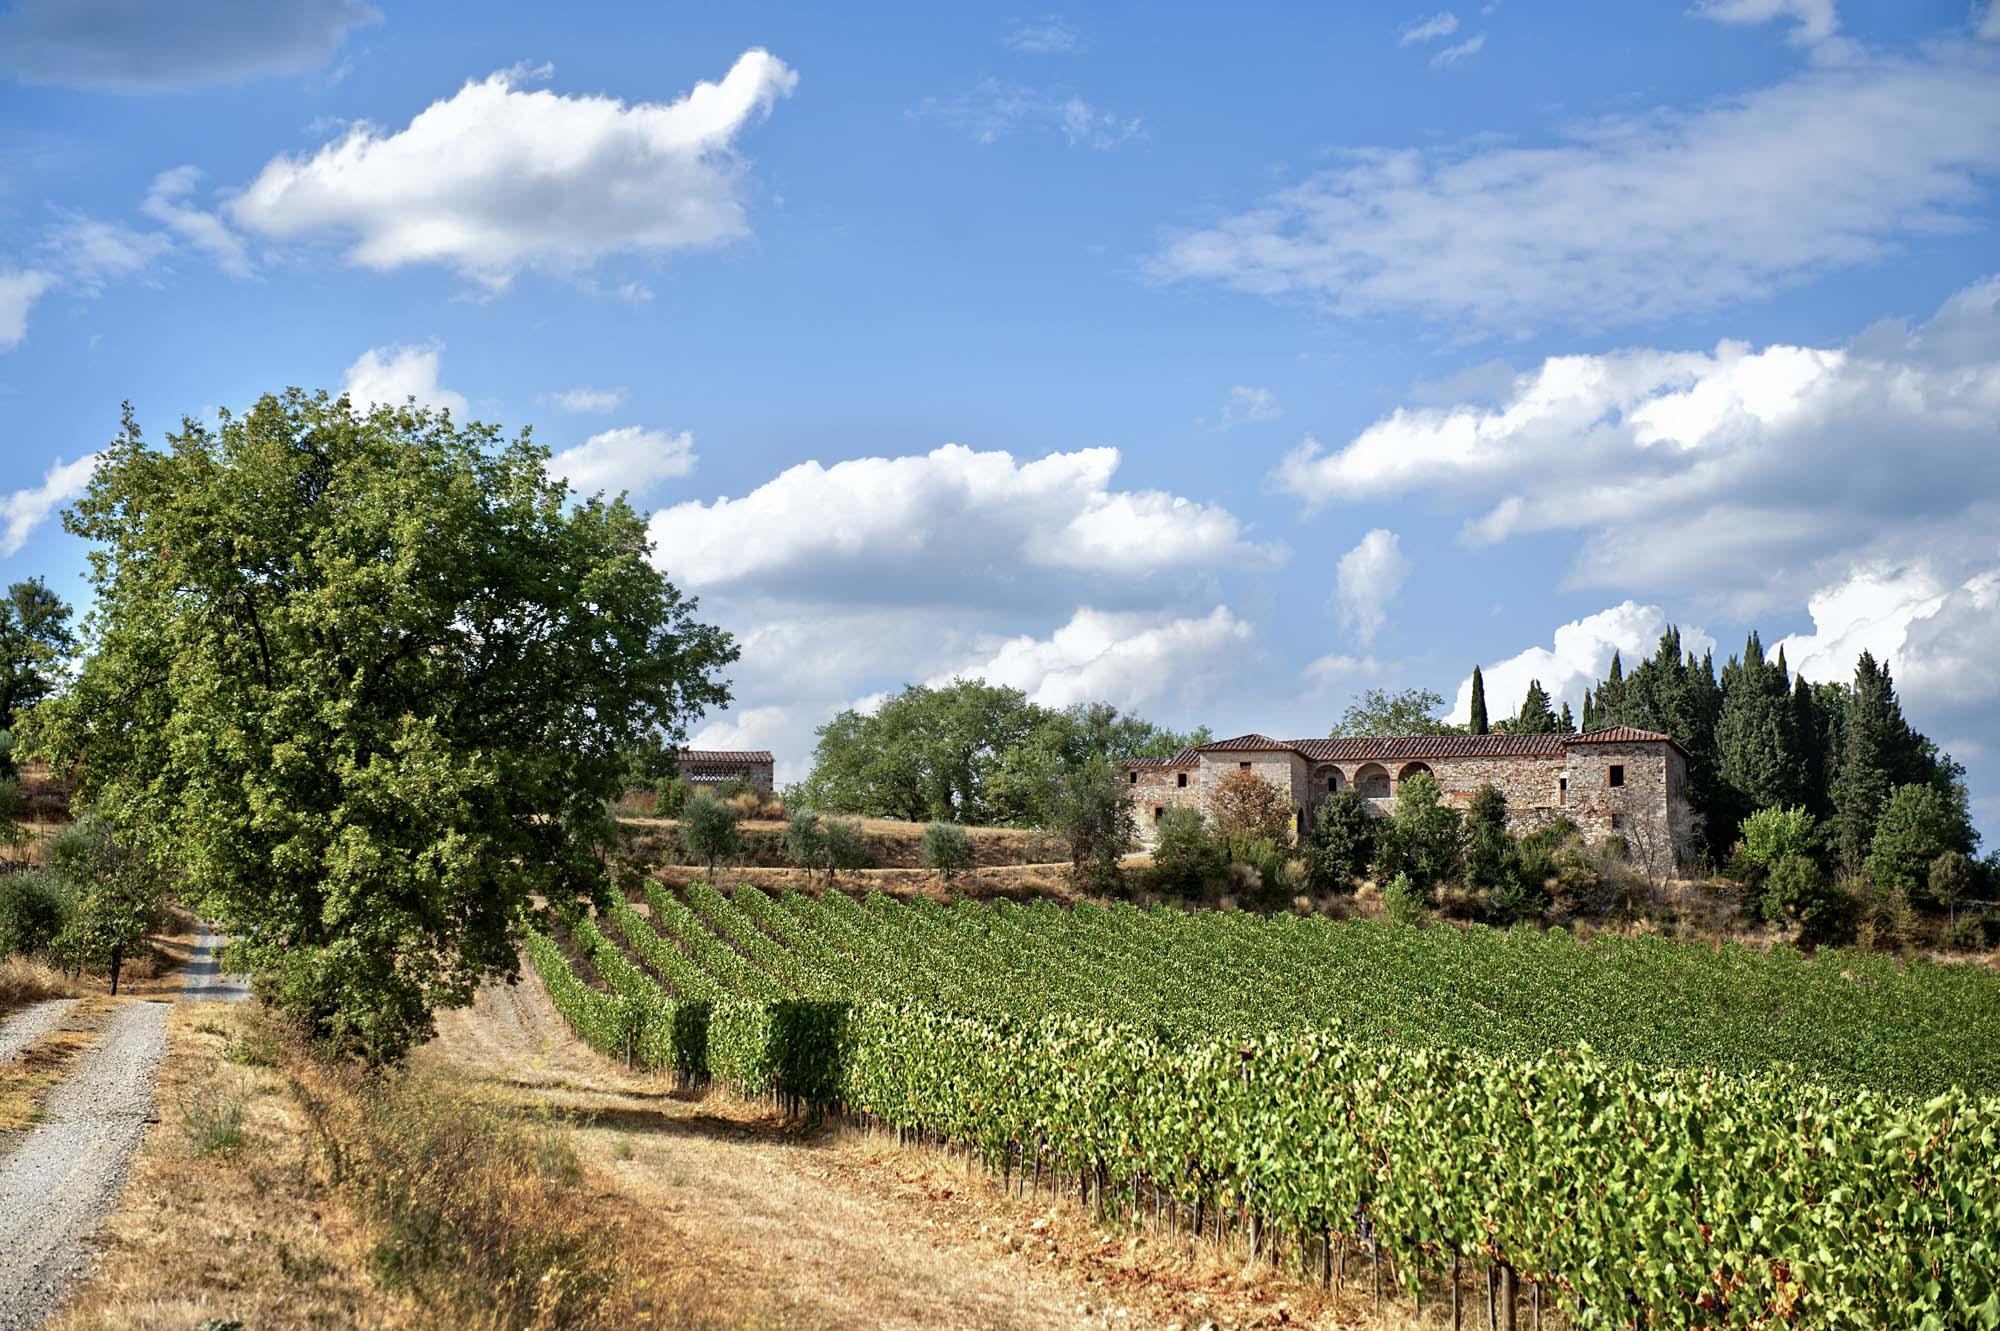 Wine Photography, Fotografia aziendale per Aziende Vitivinicole, Agriturismi e Relais